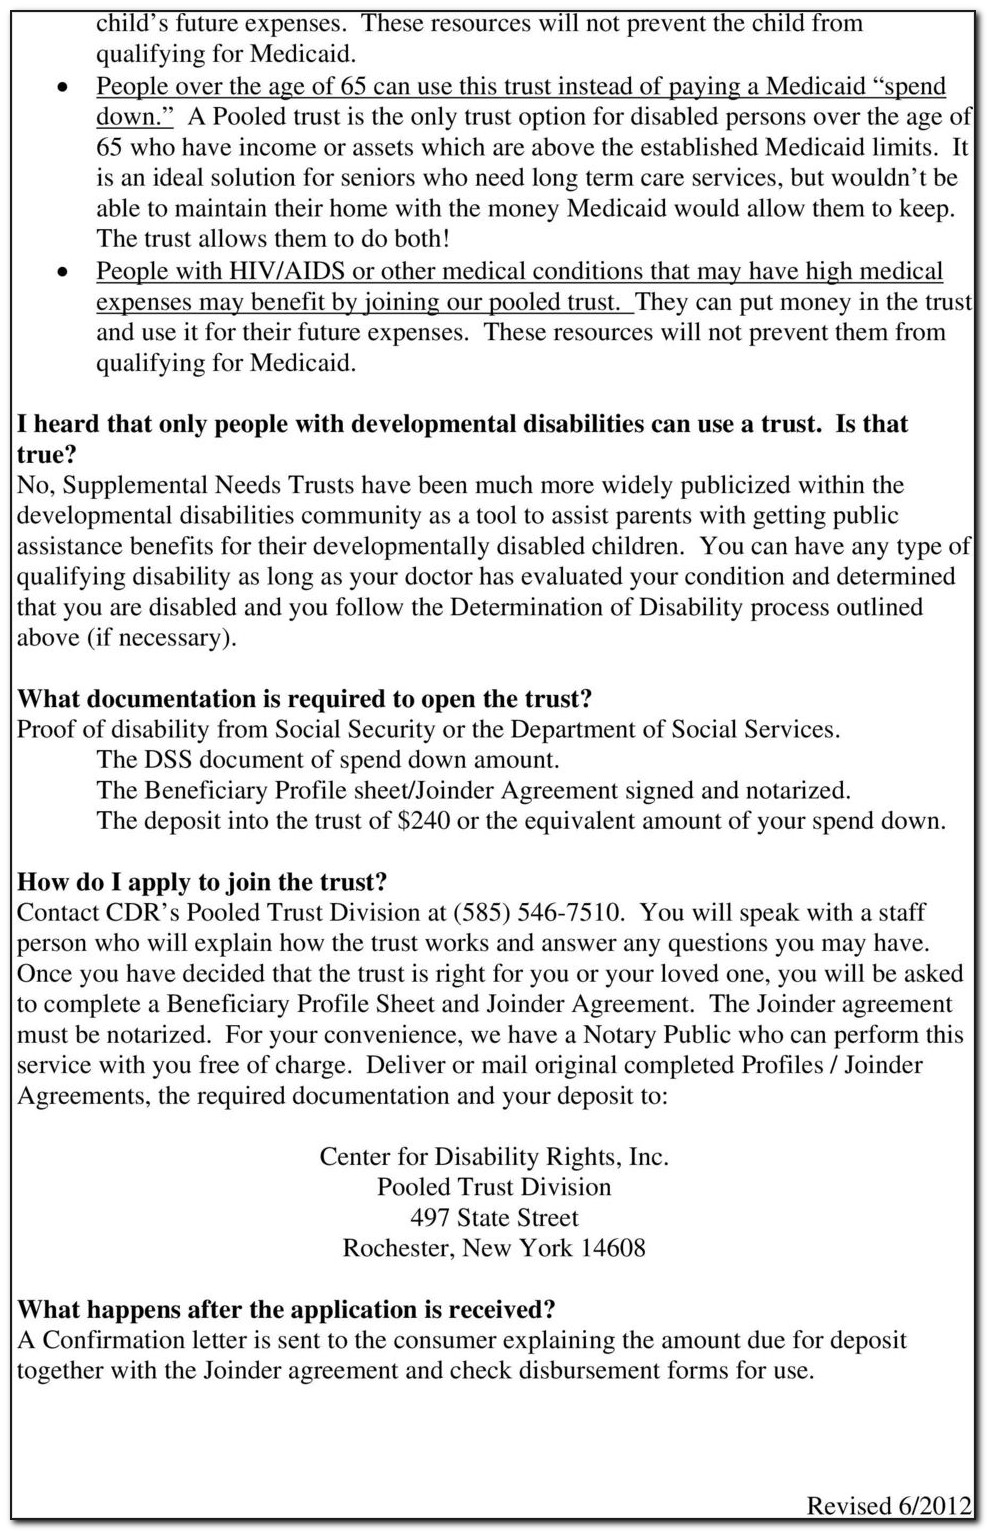 Supplemental Needs Trust Form New York